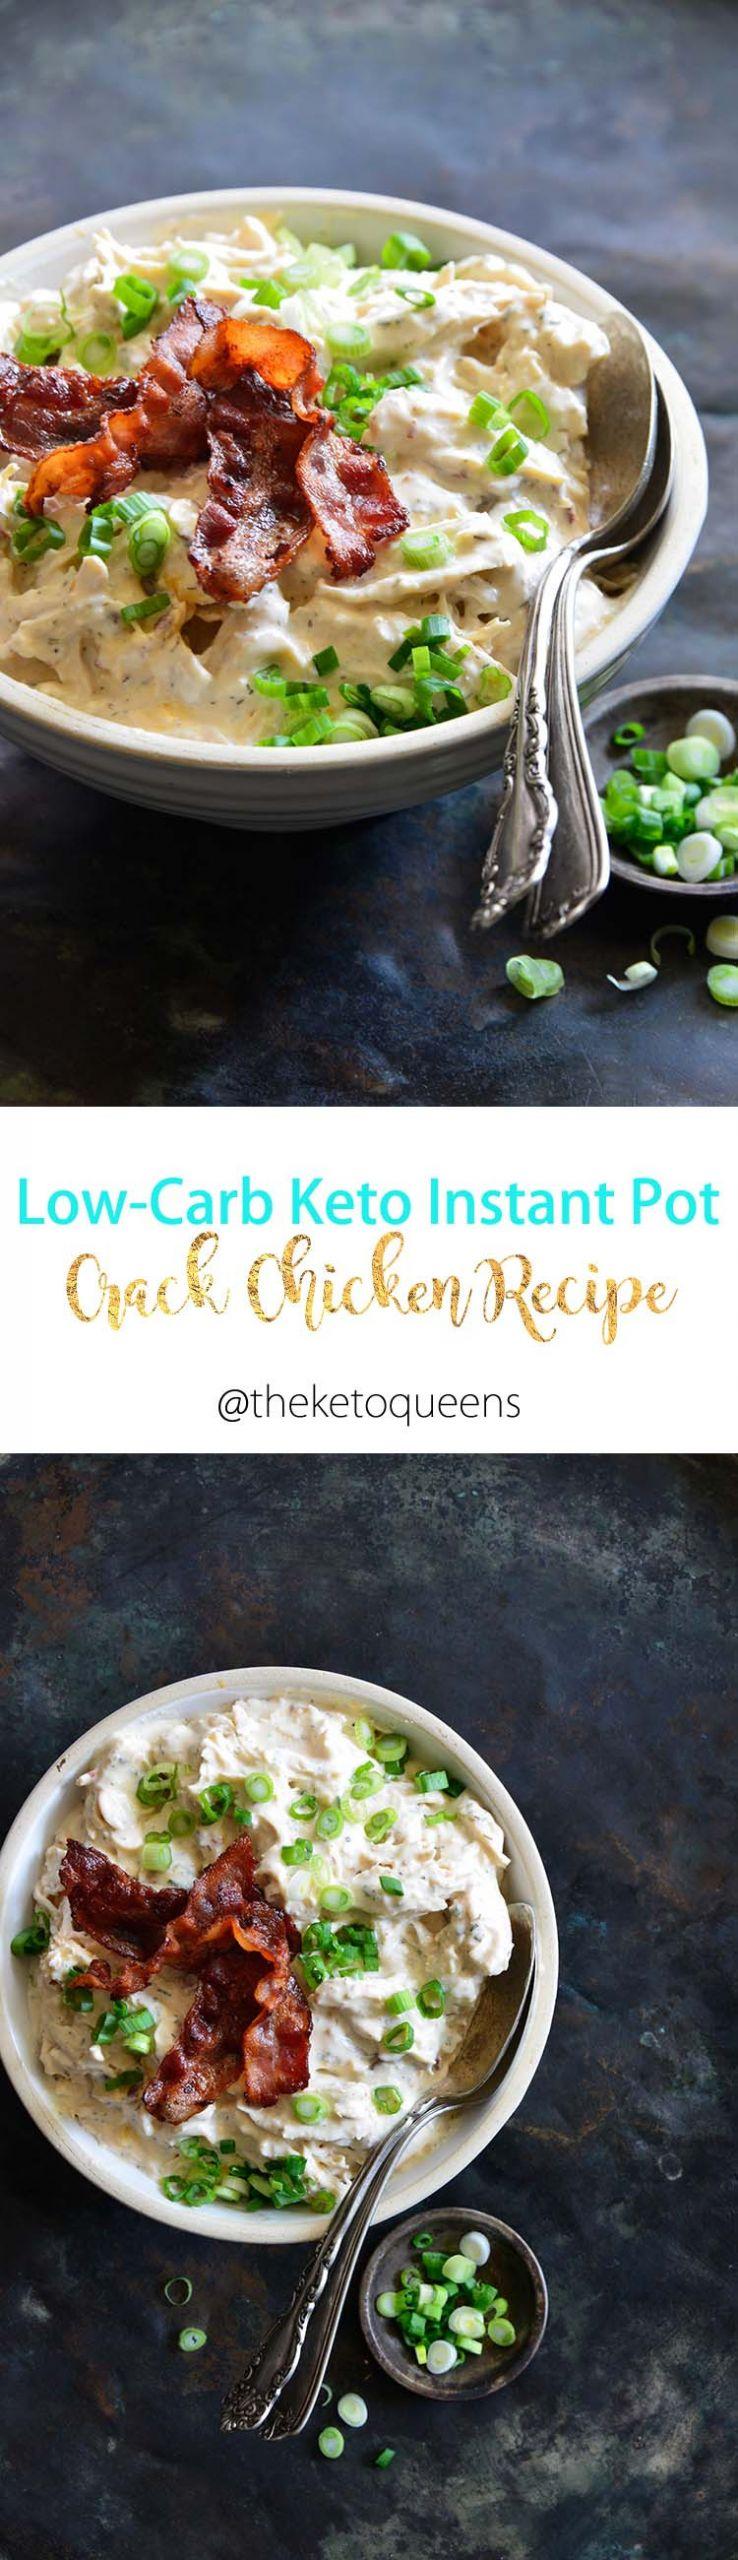 Instant Pot Keto Chicken Recipes Easy  Easy Keto Low Carb Instant Pot Crack Chicken Recipe